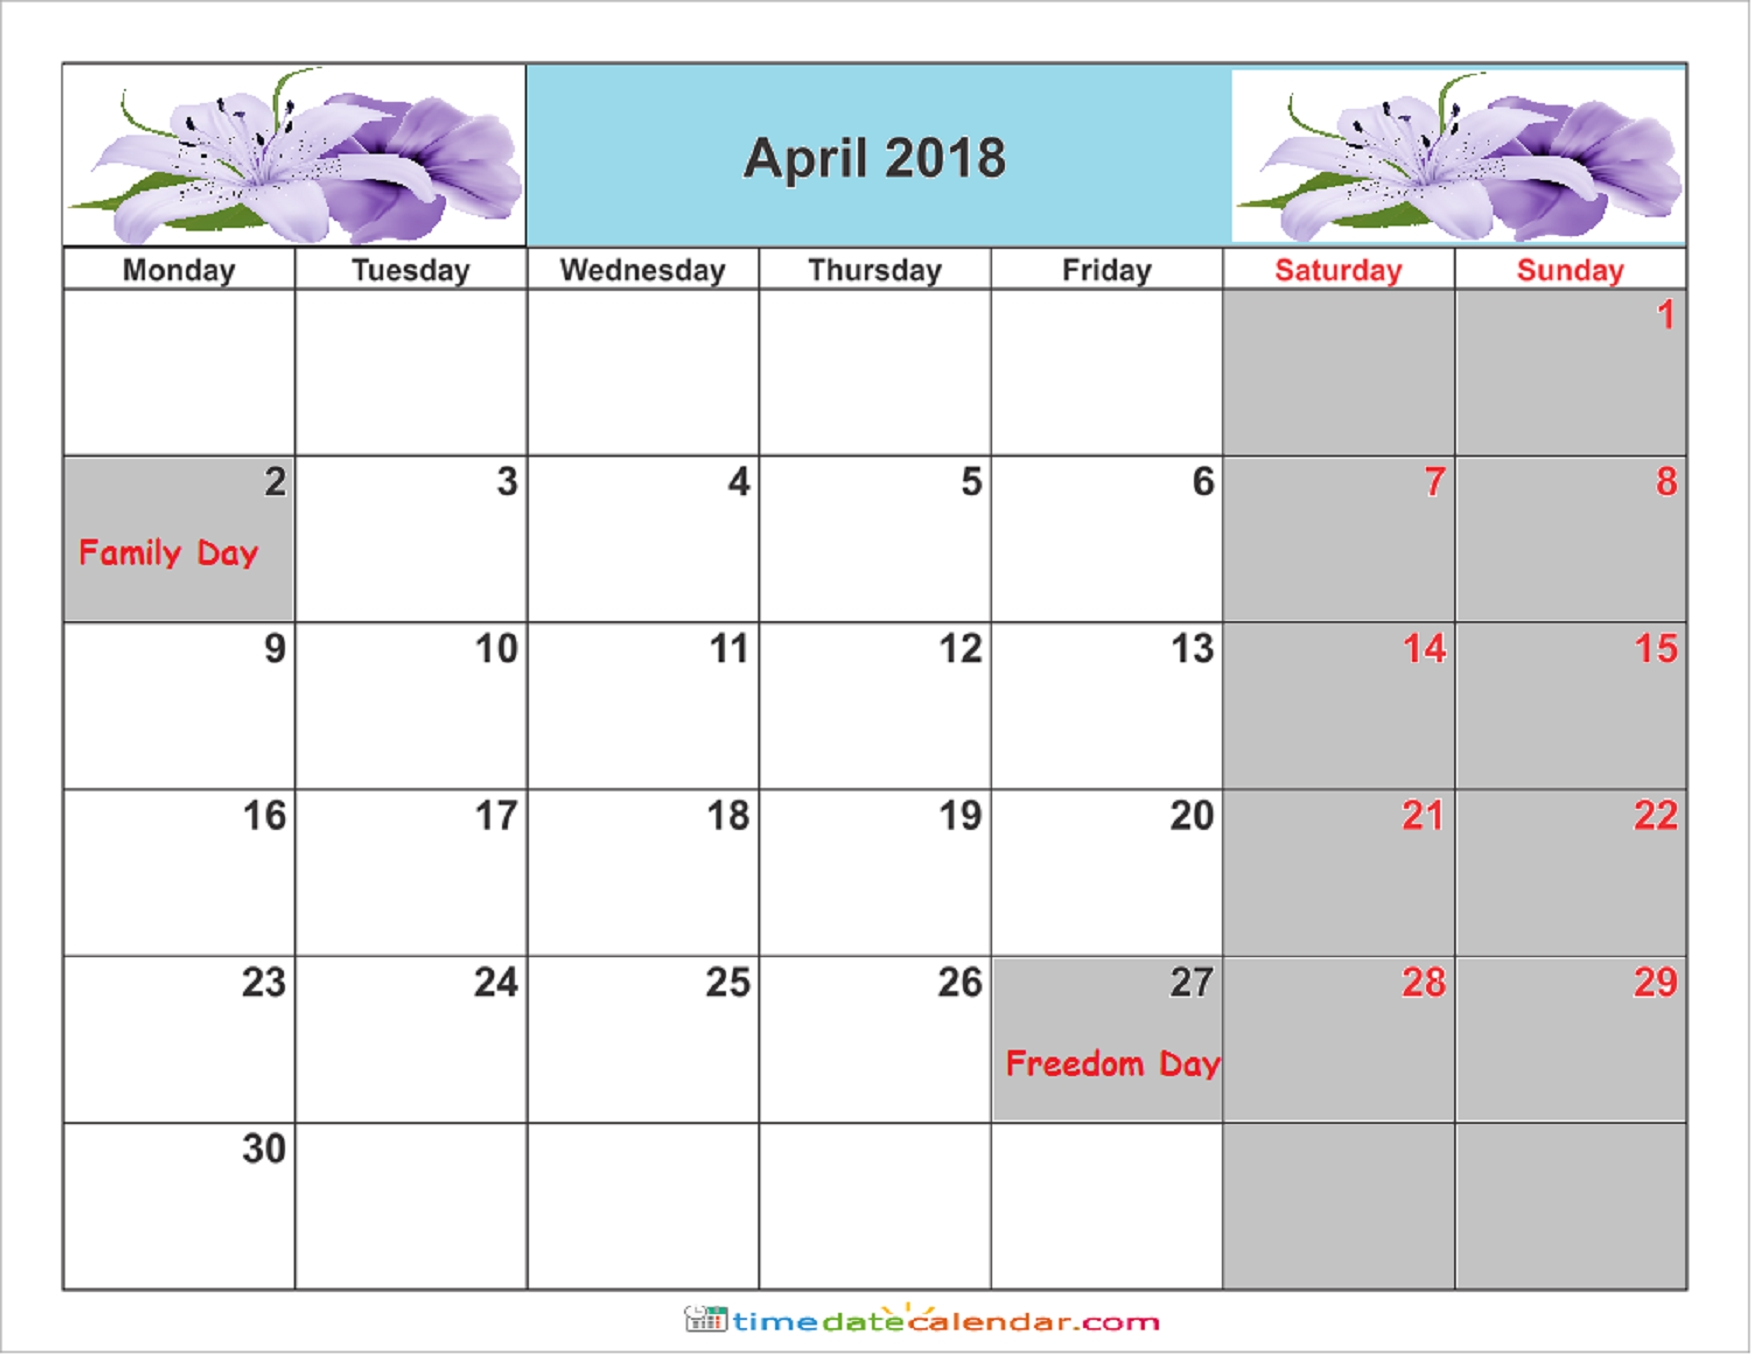 April 2018 Calendar South Africa - Free Printable Template-Calendar Template South Africa